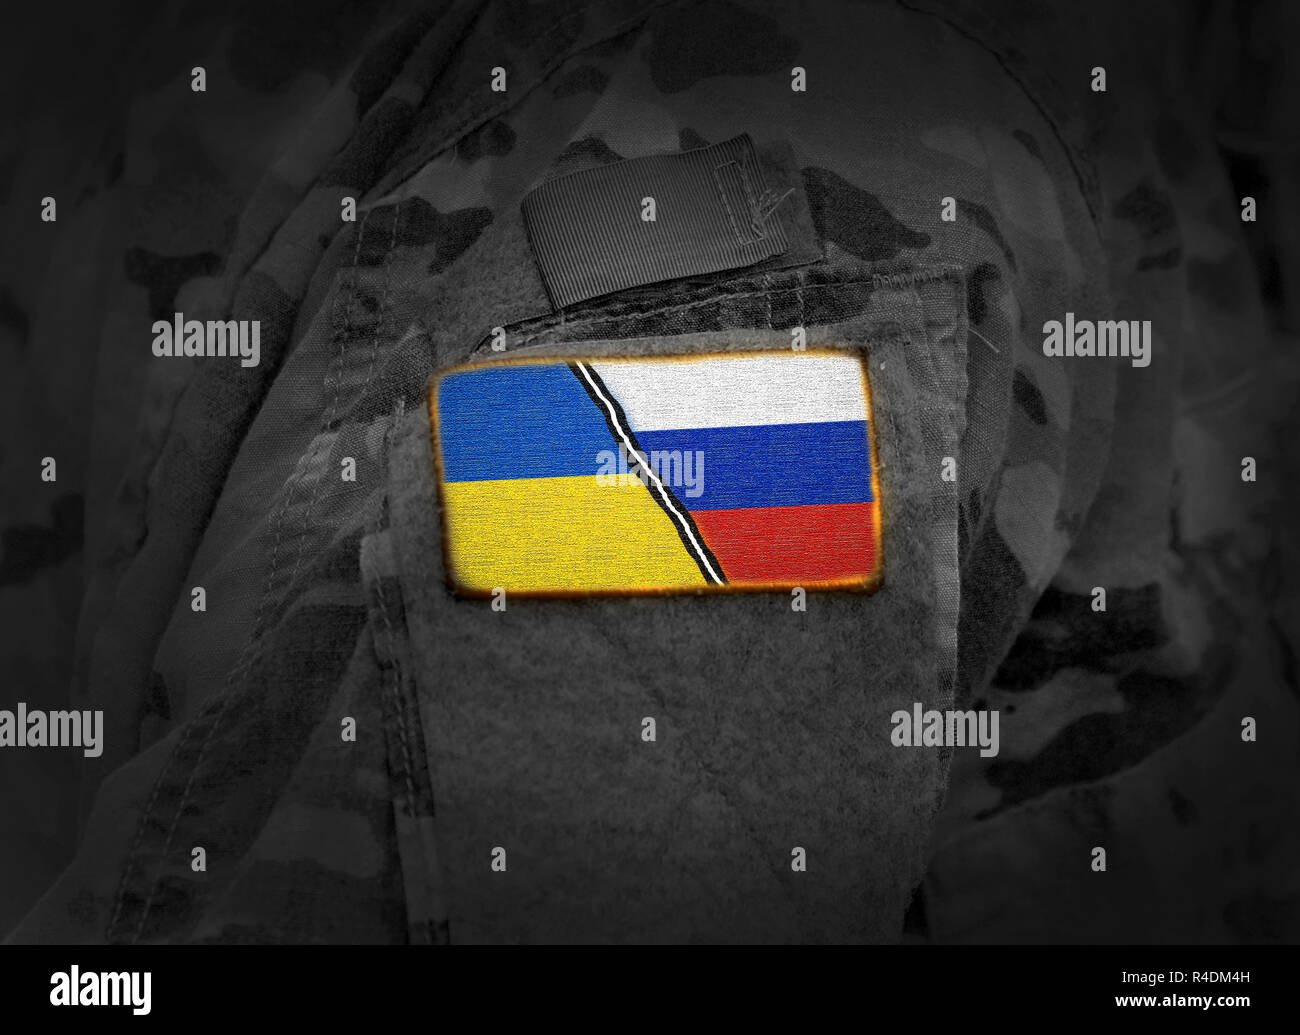 Ukraine vs Russia. Ukrainian Russian conflict. Flag of Ukraine and Russia at military uniform (collage) - Stock Image